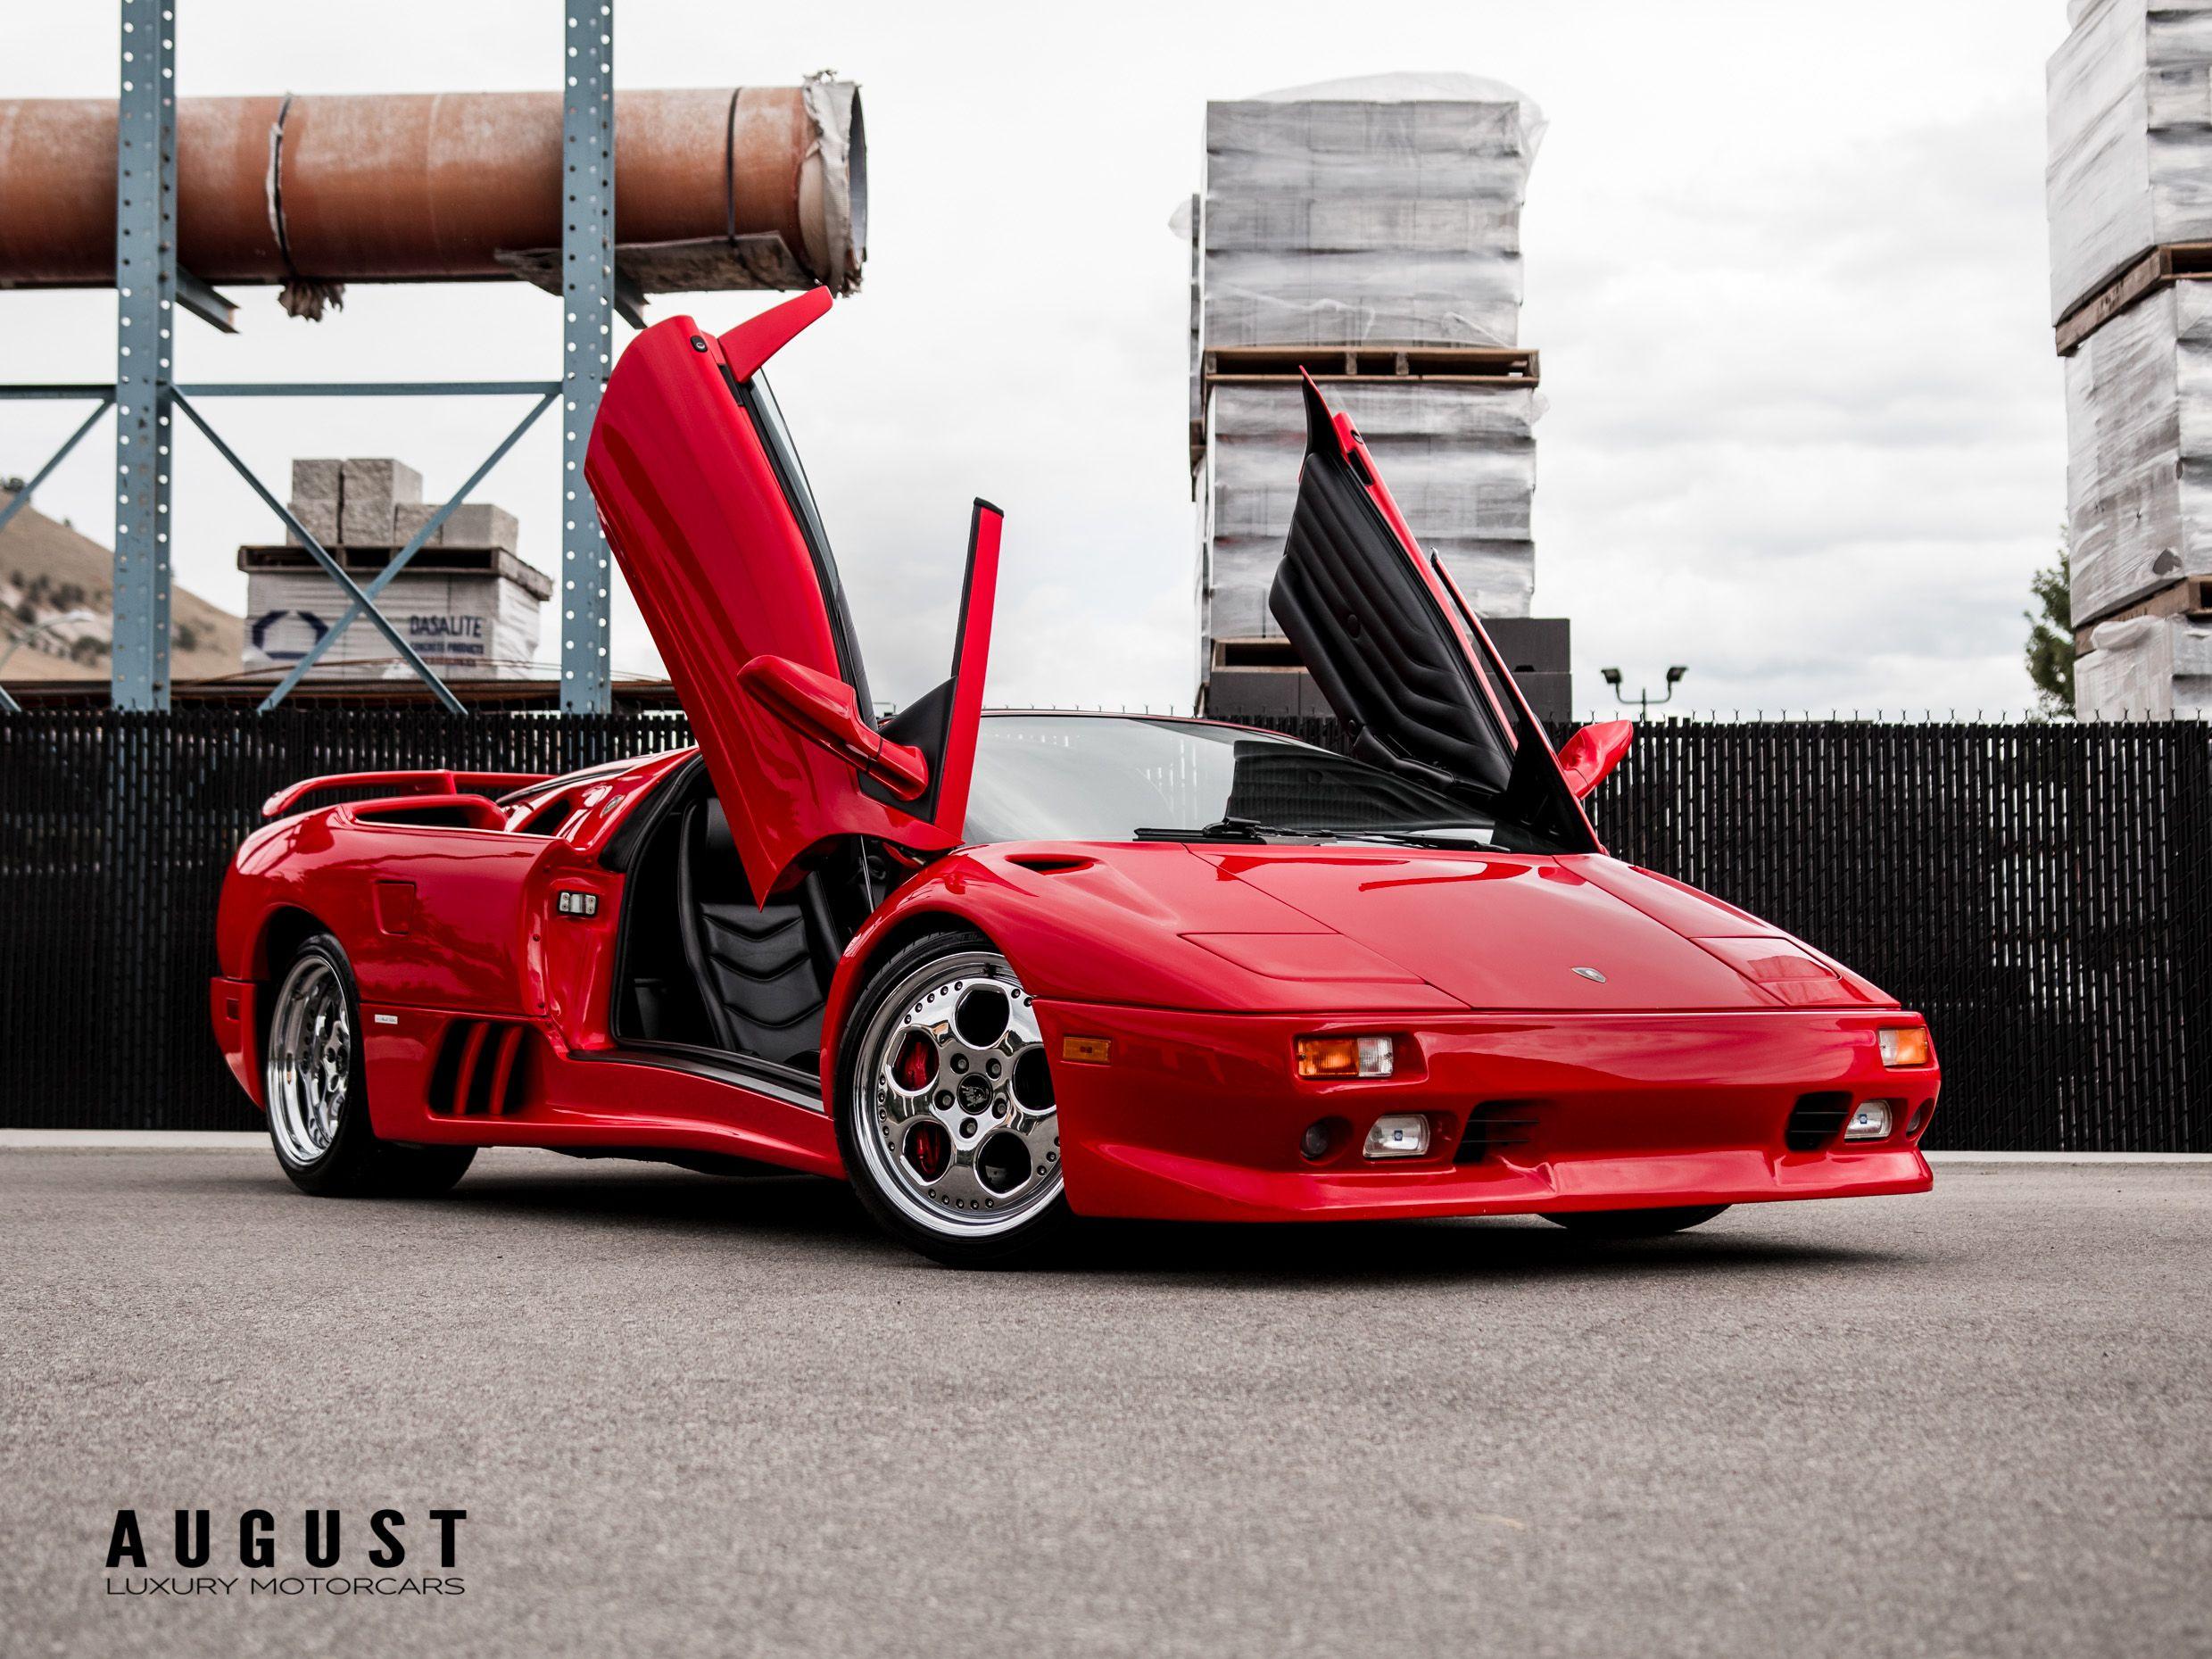 Pre-Owned 1998 Lamborghini Diablo VT Roadster